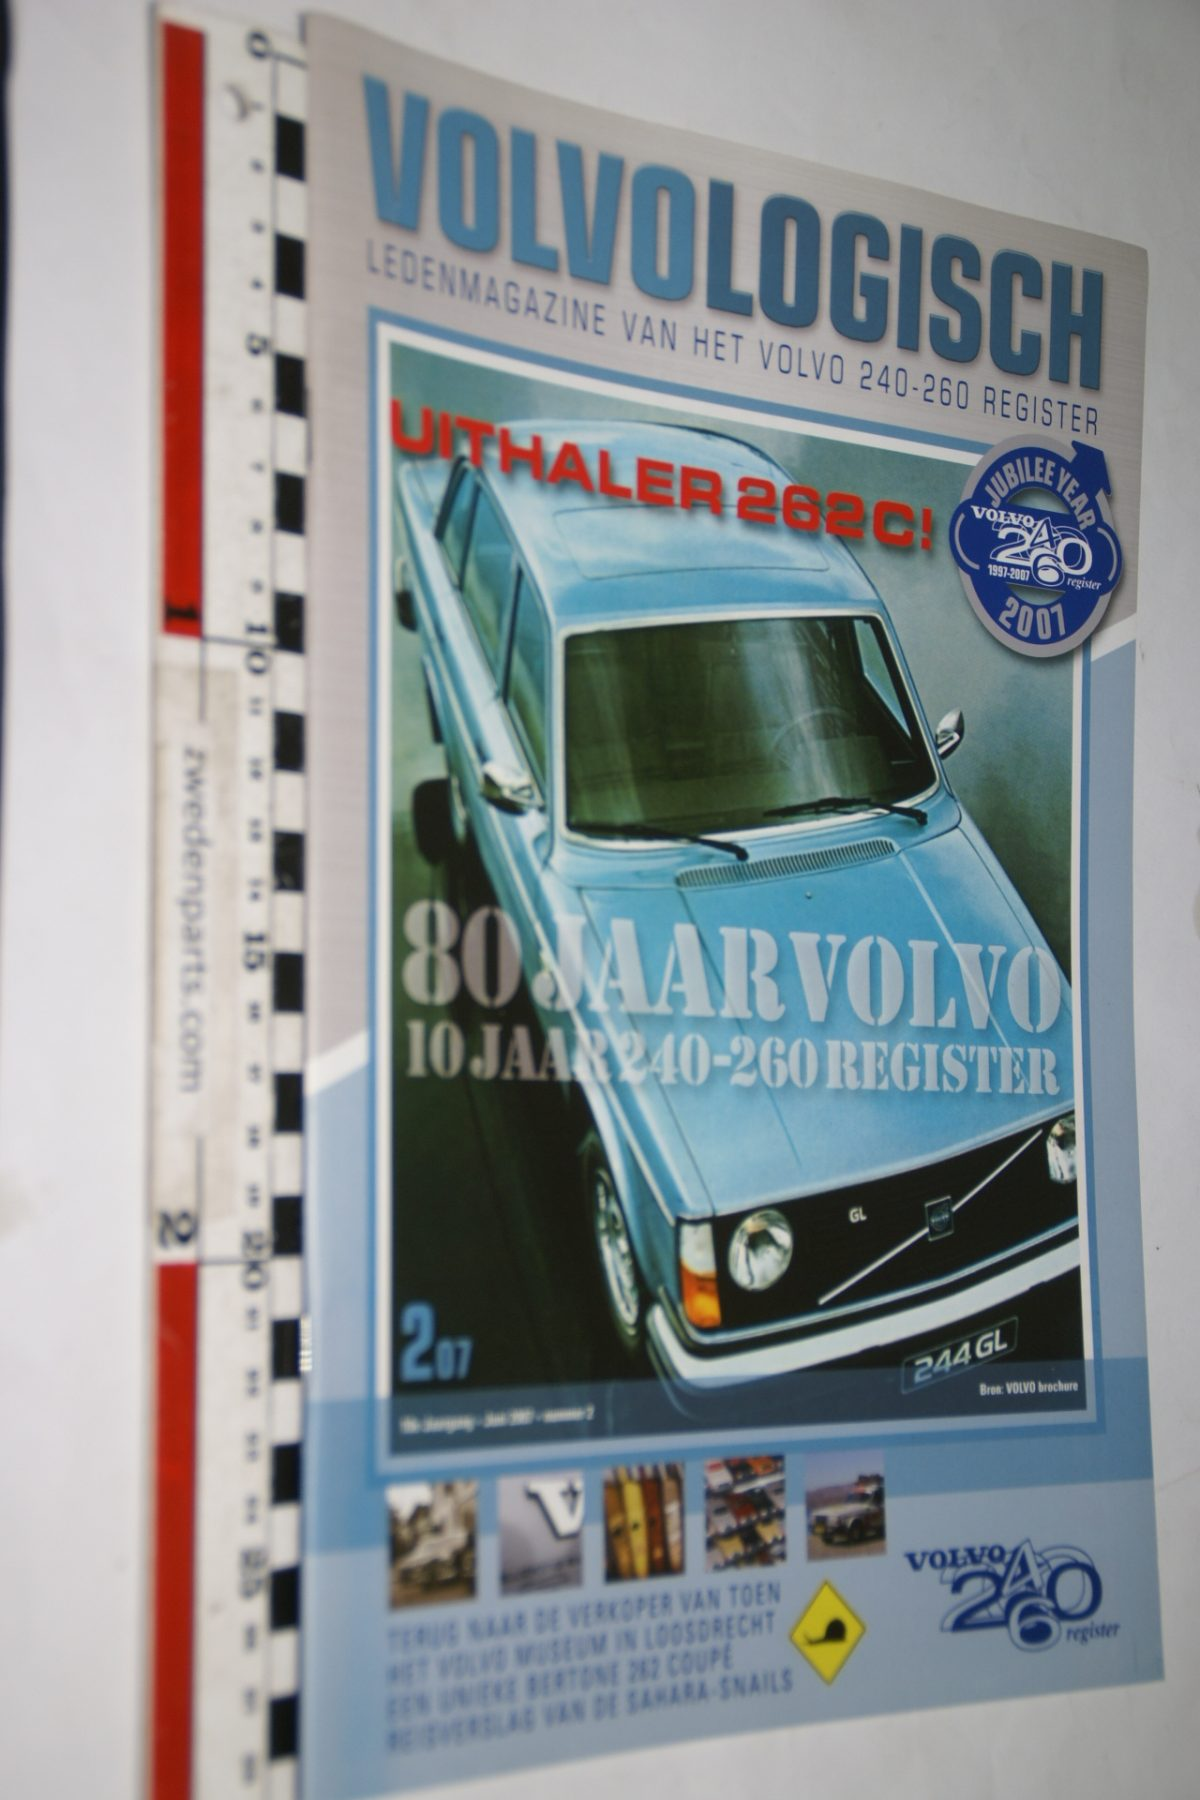 DSC05173 2007 tijdschrift Volvo Logisch 240 260